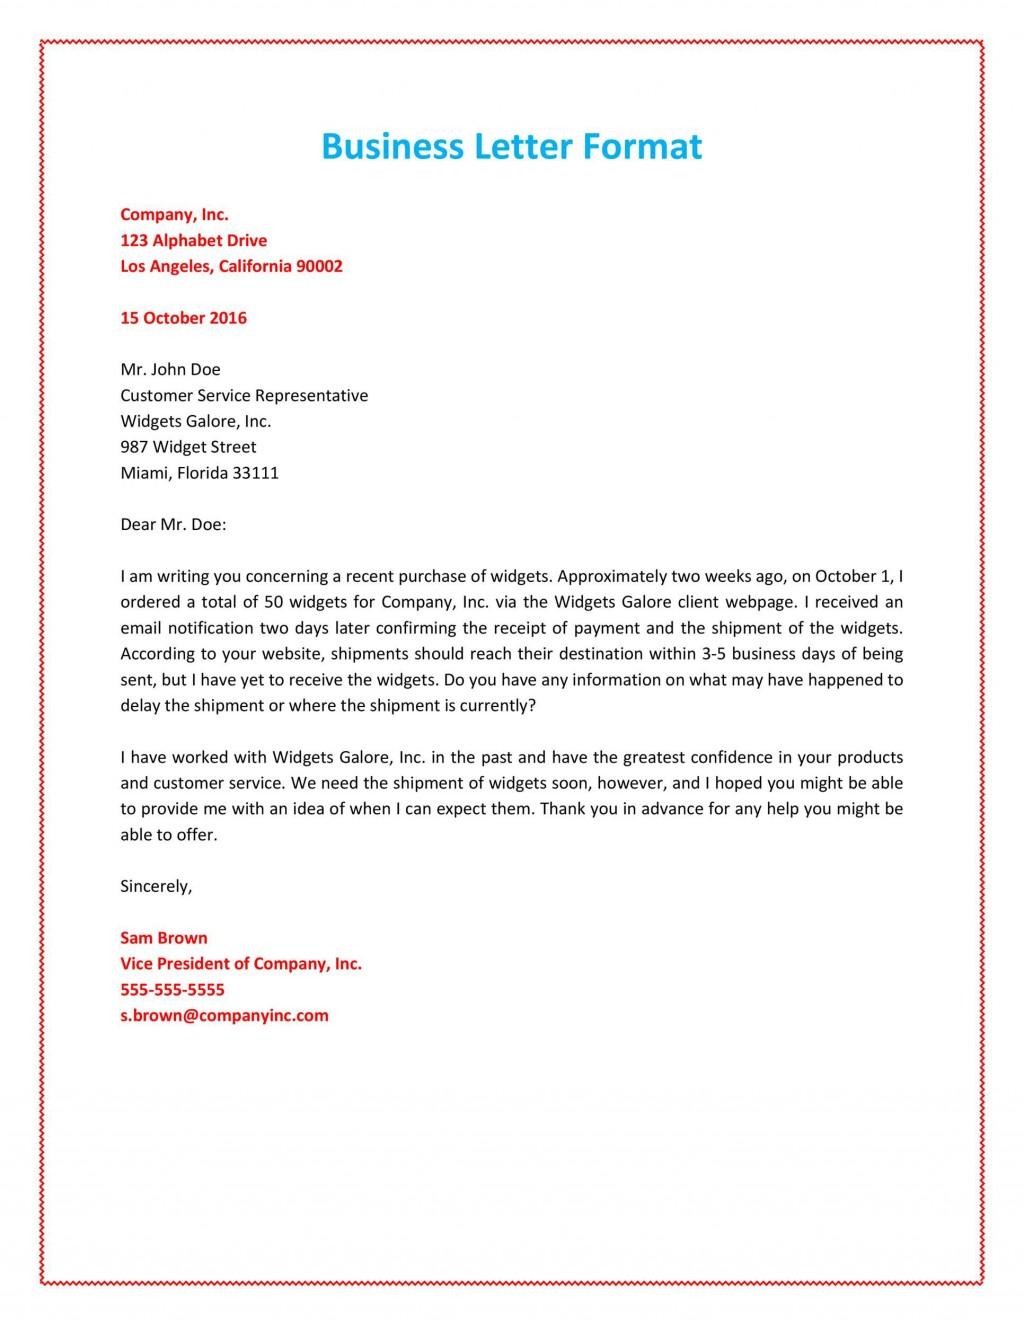 011 Marvelou Busines Letter Template Word Sample  Cover FreeLarge